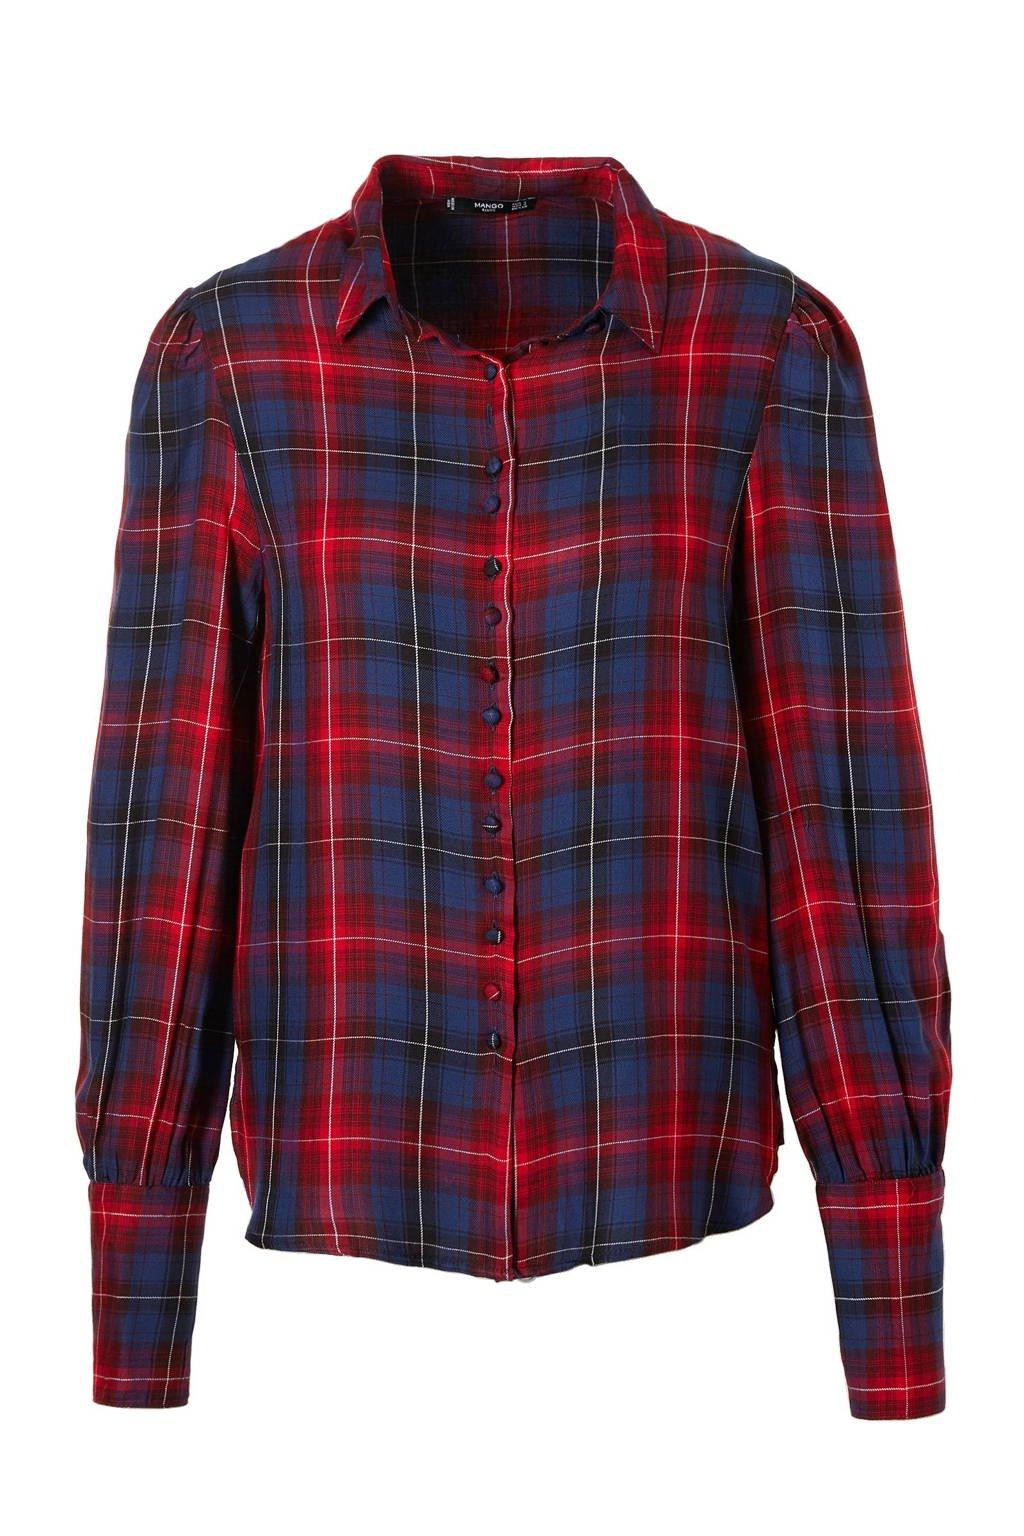 Mango blouse met ruitdessin, Blauw/rood